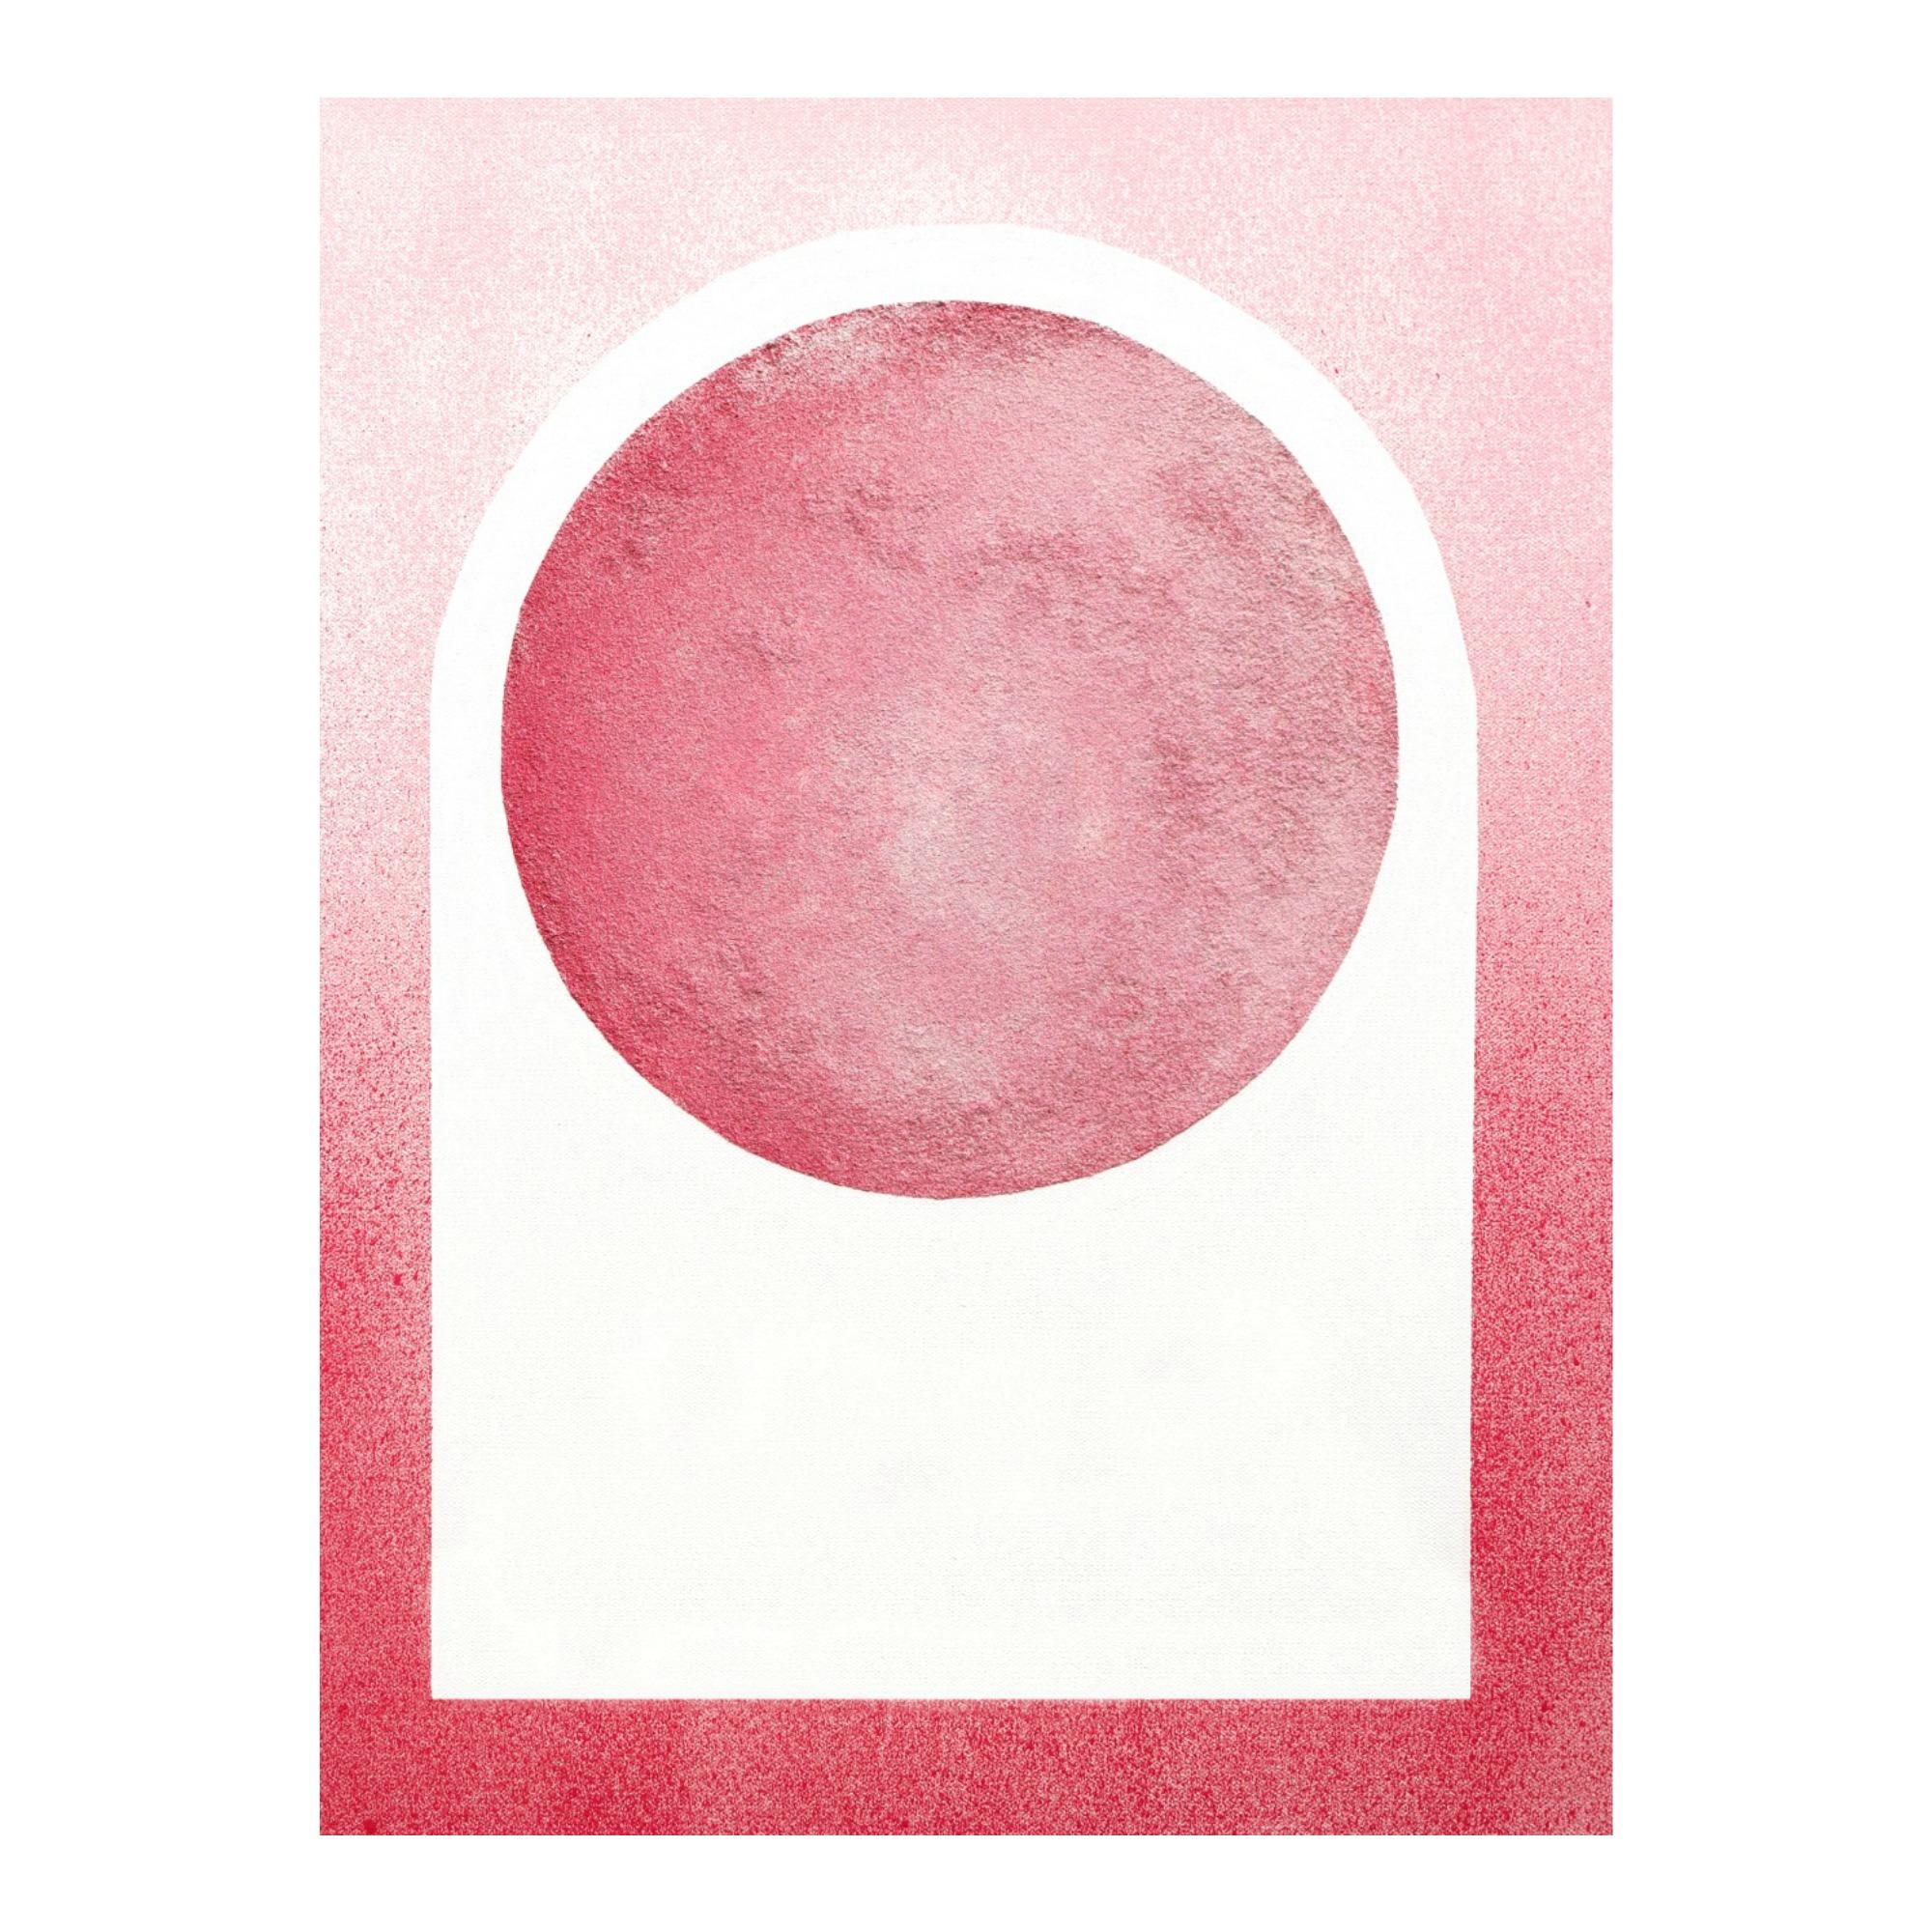 moonarch instapink.jpg